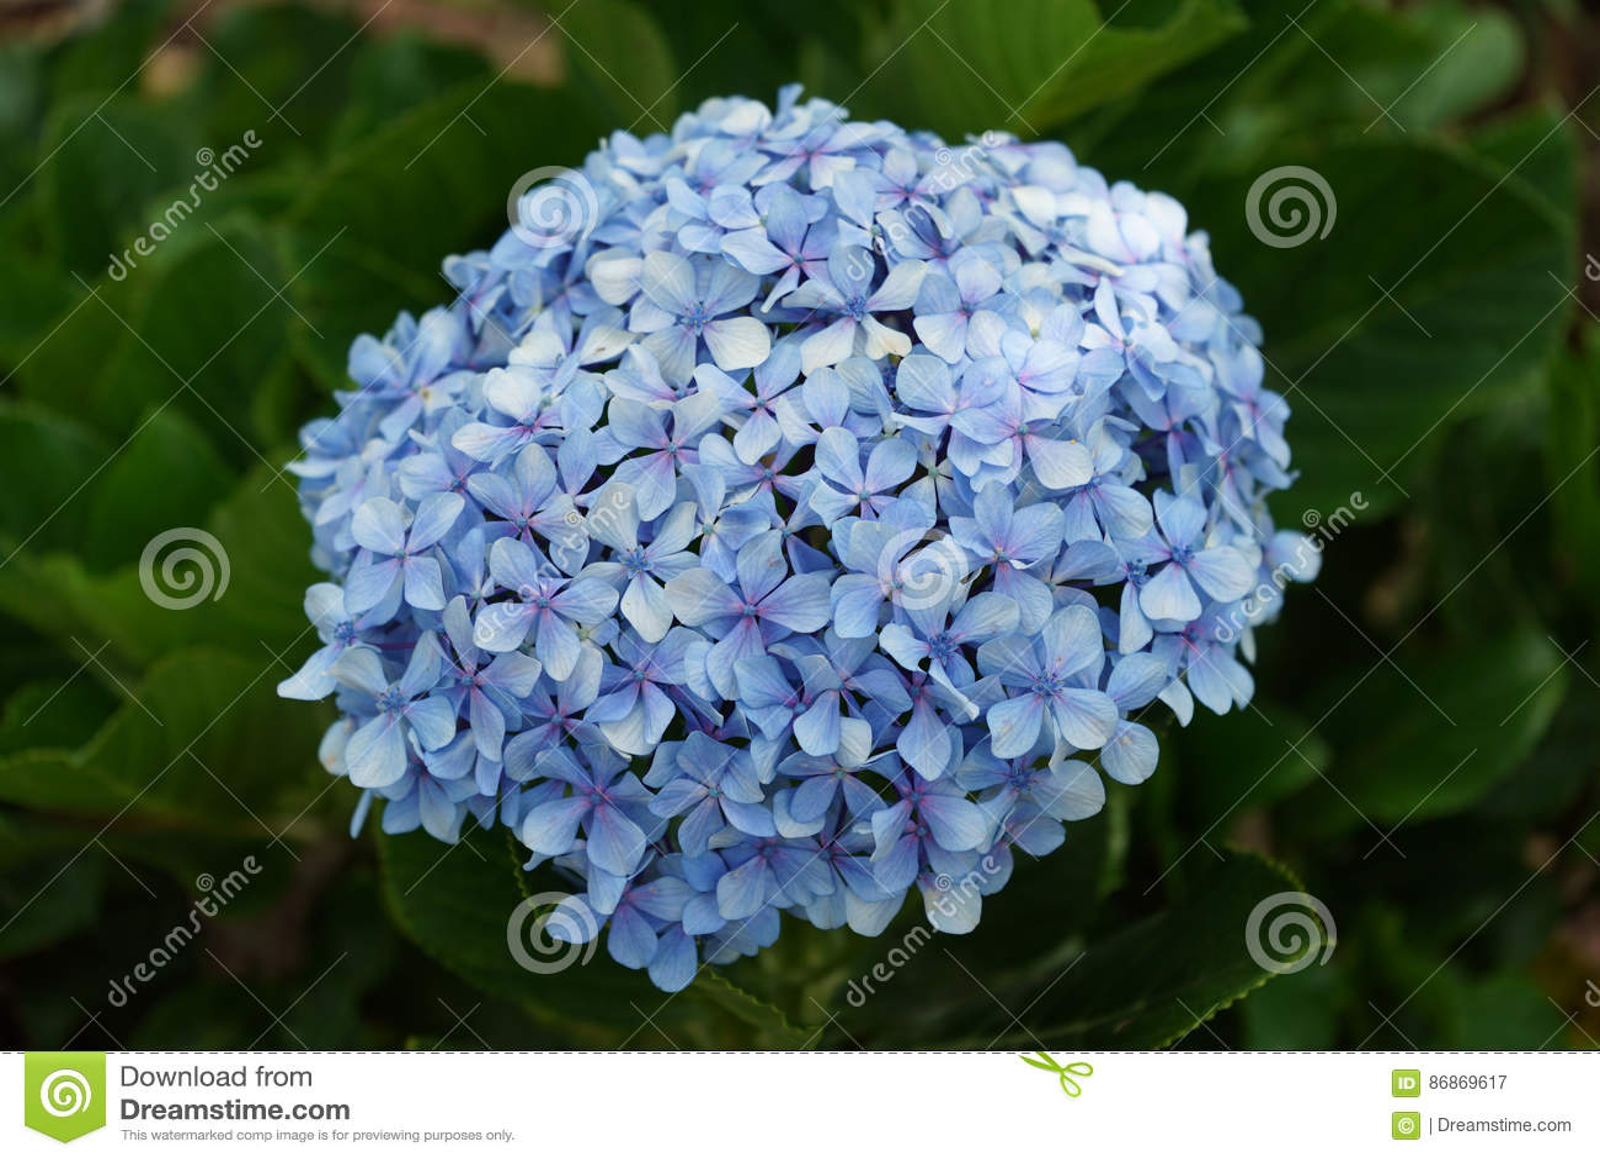 Blauwe bloemhydrangea hortensia Sluit omhoog